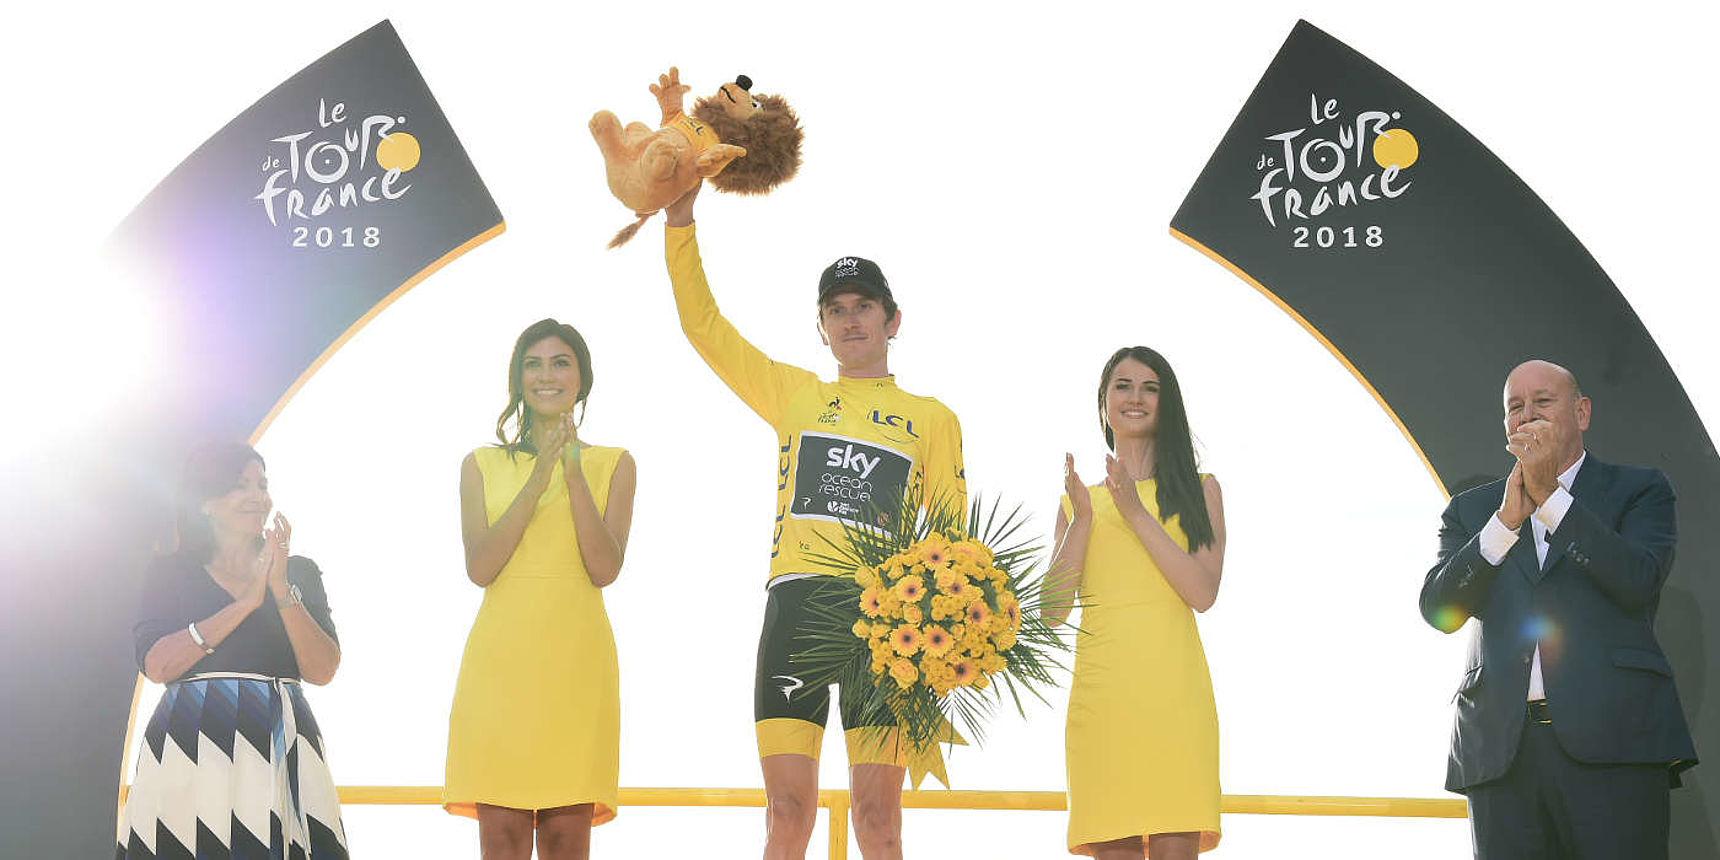 Deutschland Tour Homepage 2018 Official Of The Emblem Plat D Jerman De France Winner Geraint Thomas To Start At